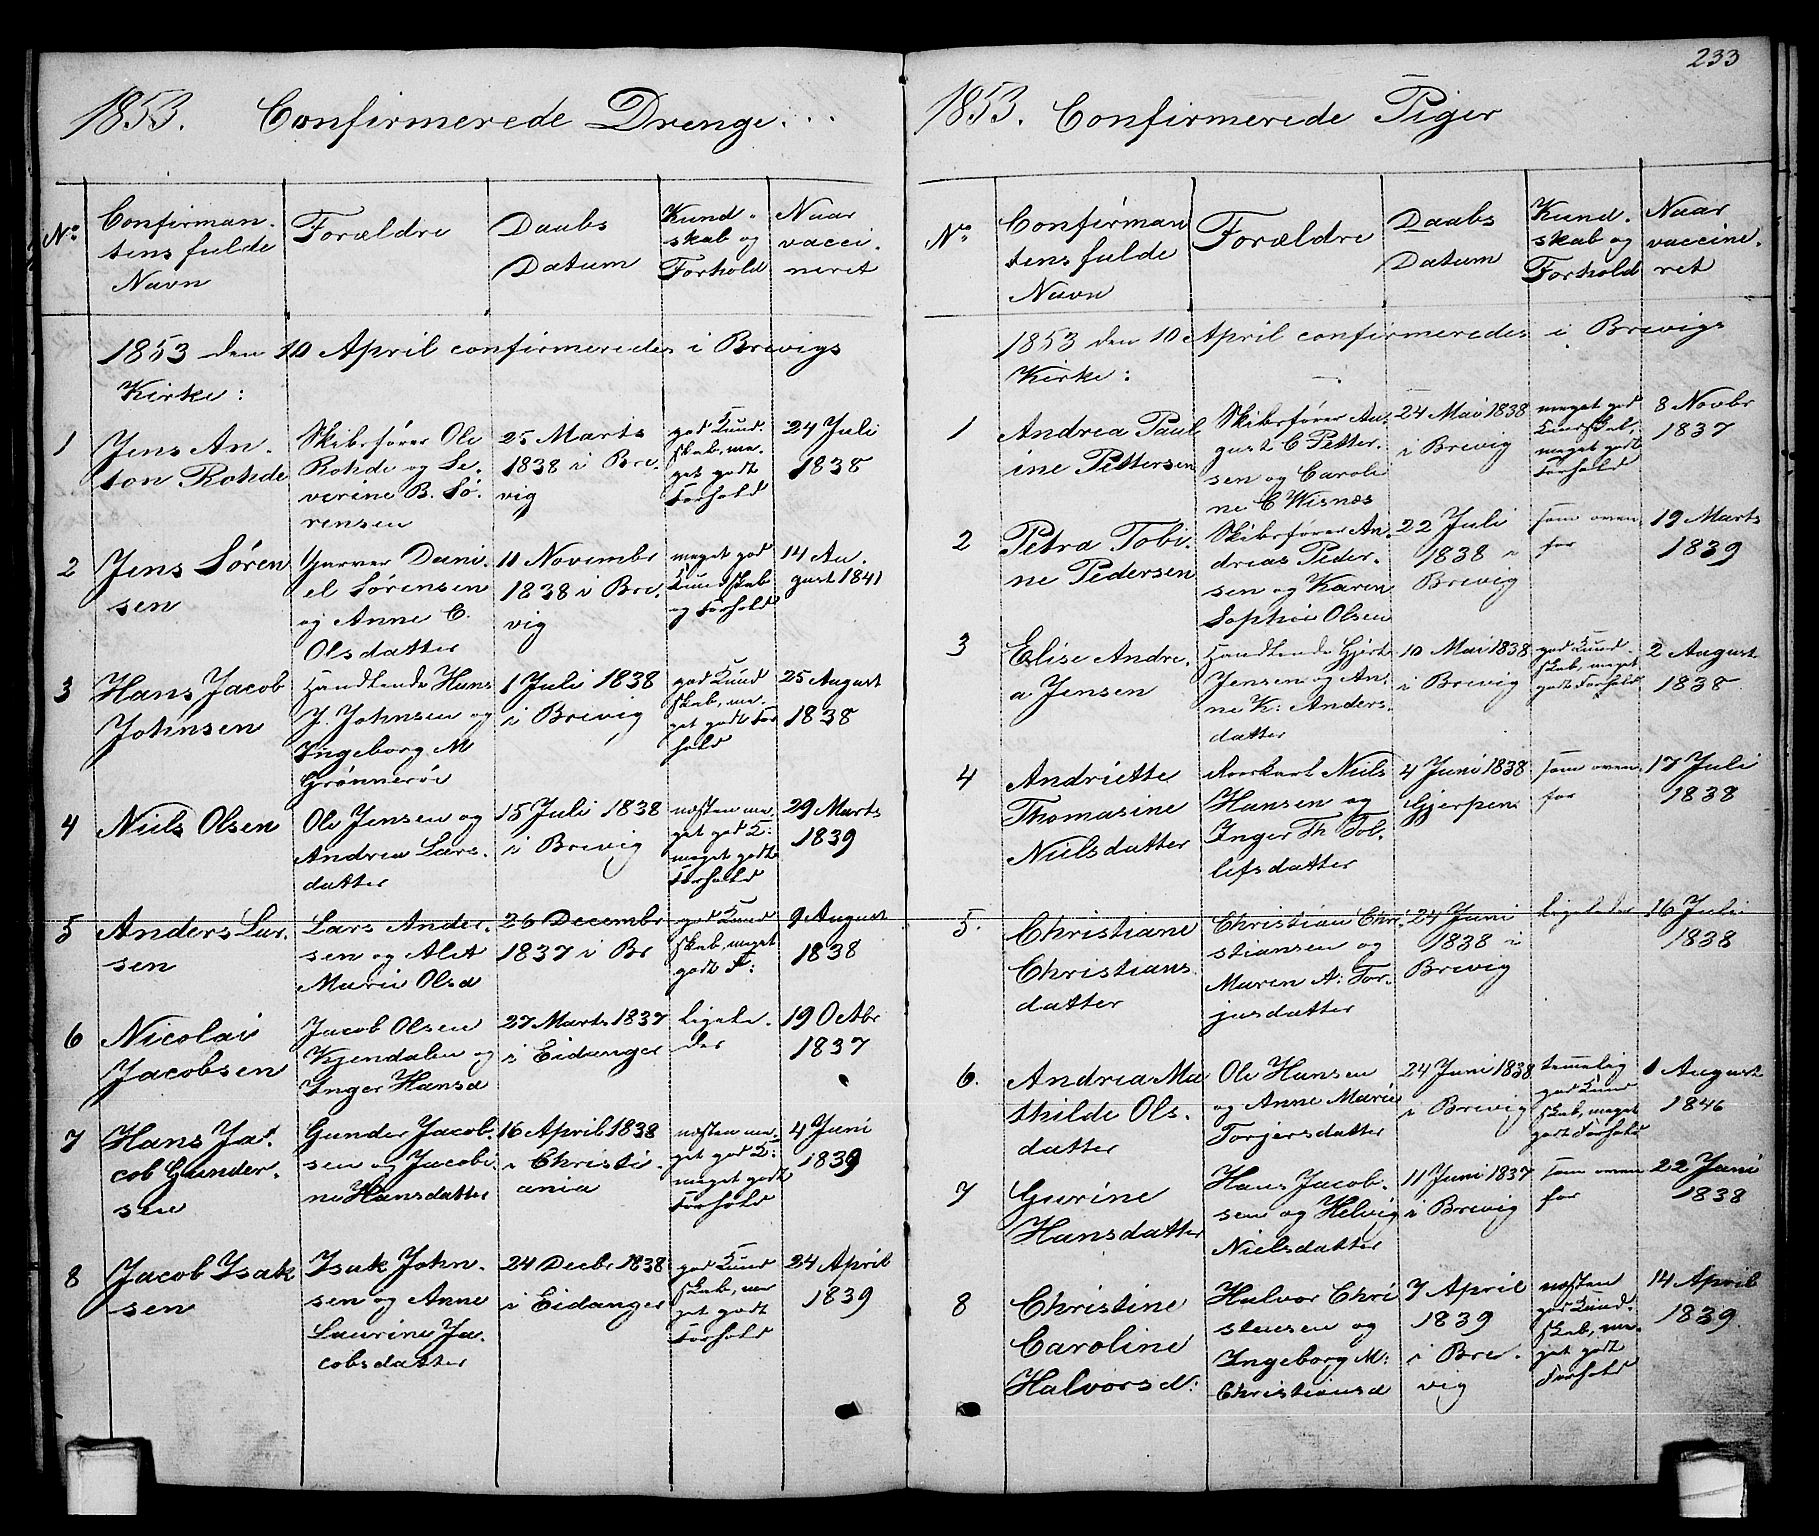 SAKO, Brevik kirkebøker, G/Ga/L0002: Klokkerbok nr. 2, 1846-1865, s. 233